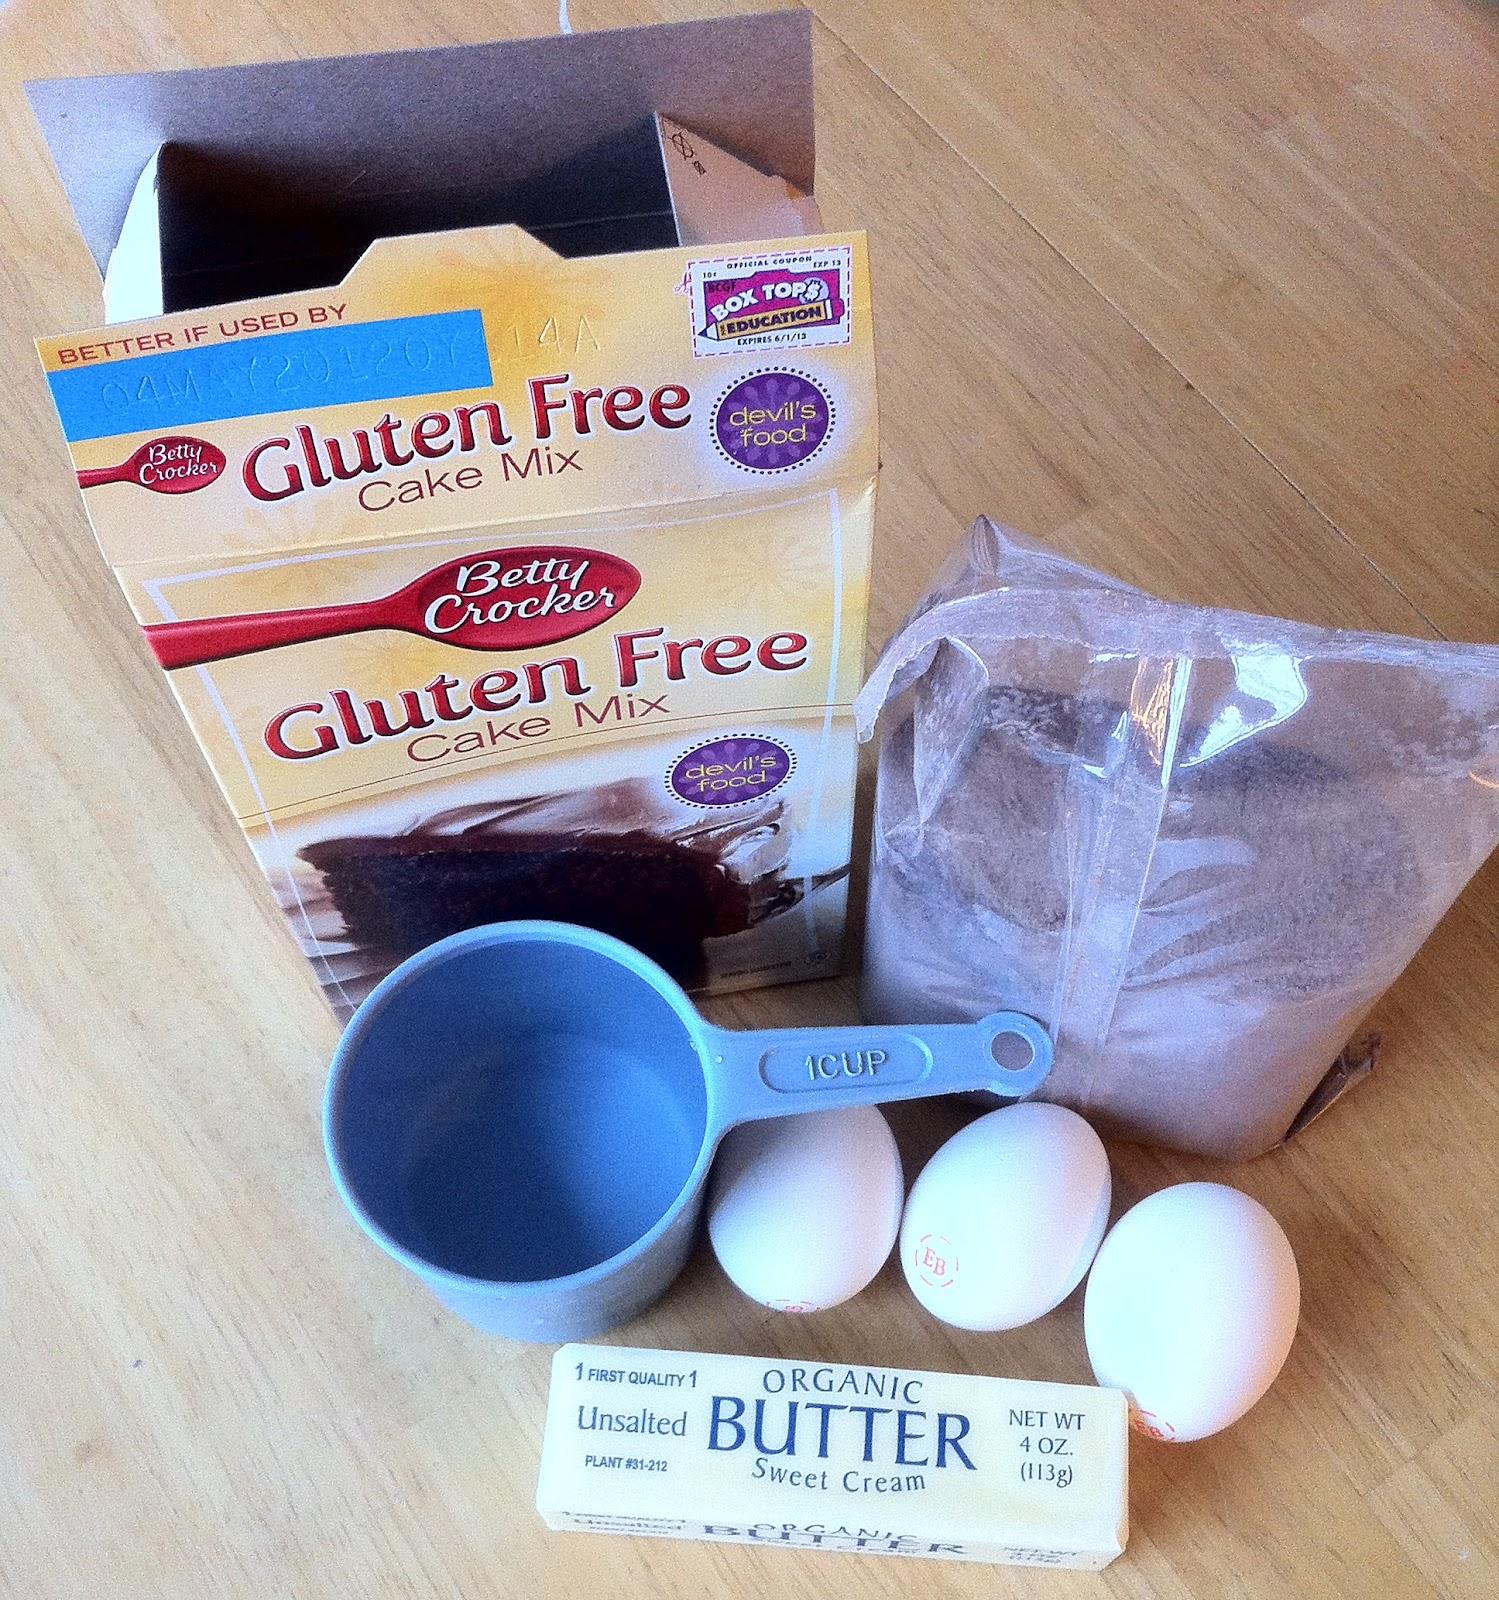 Betty Crocker Gluten Free Cake Mix and Easy Cupcake ...